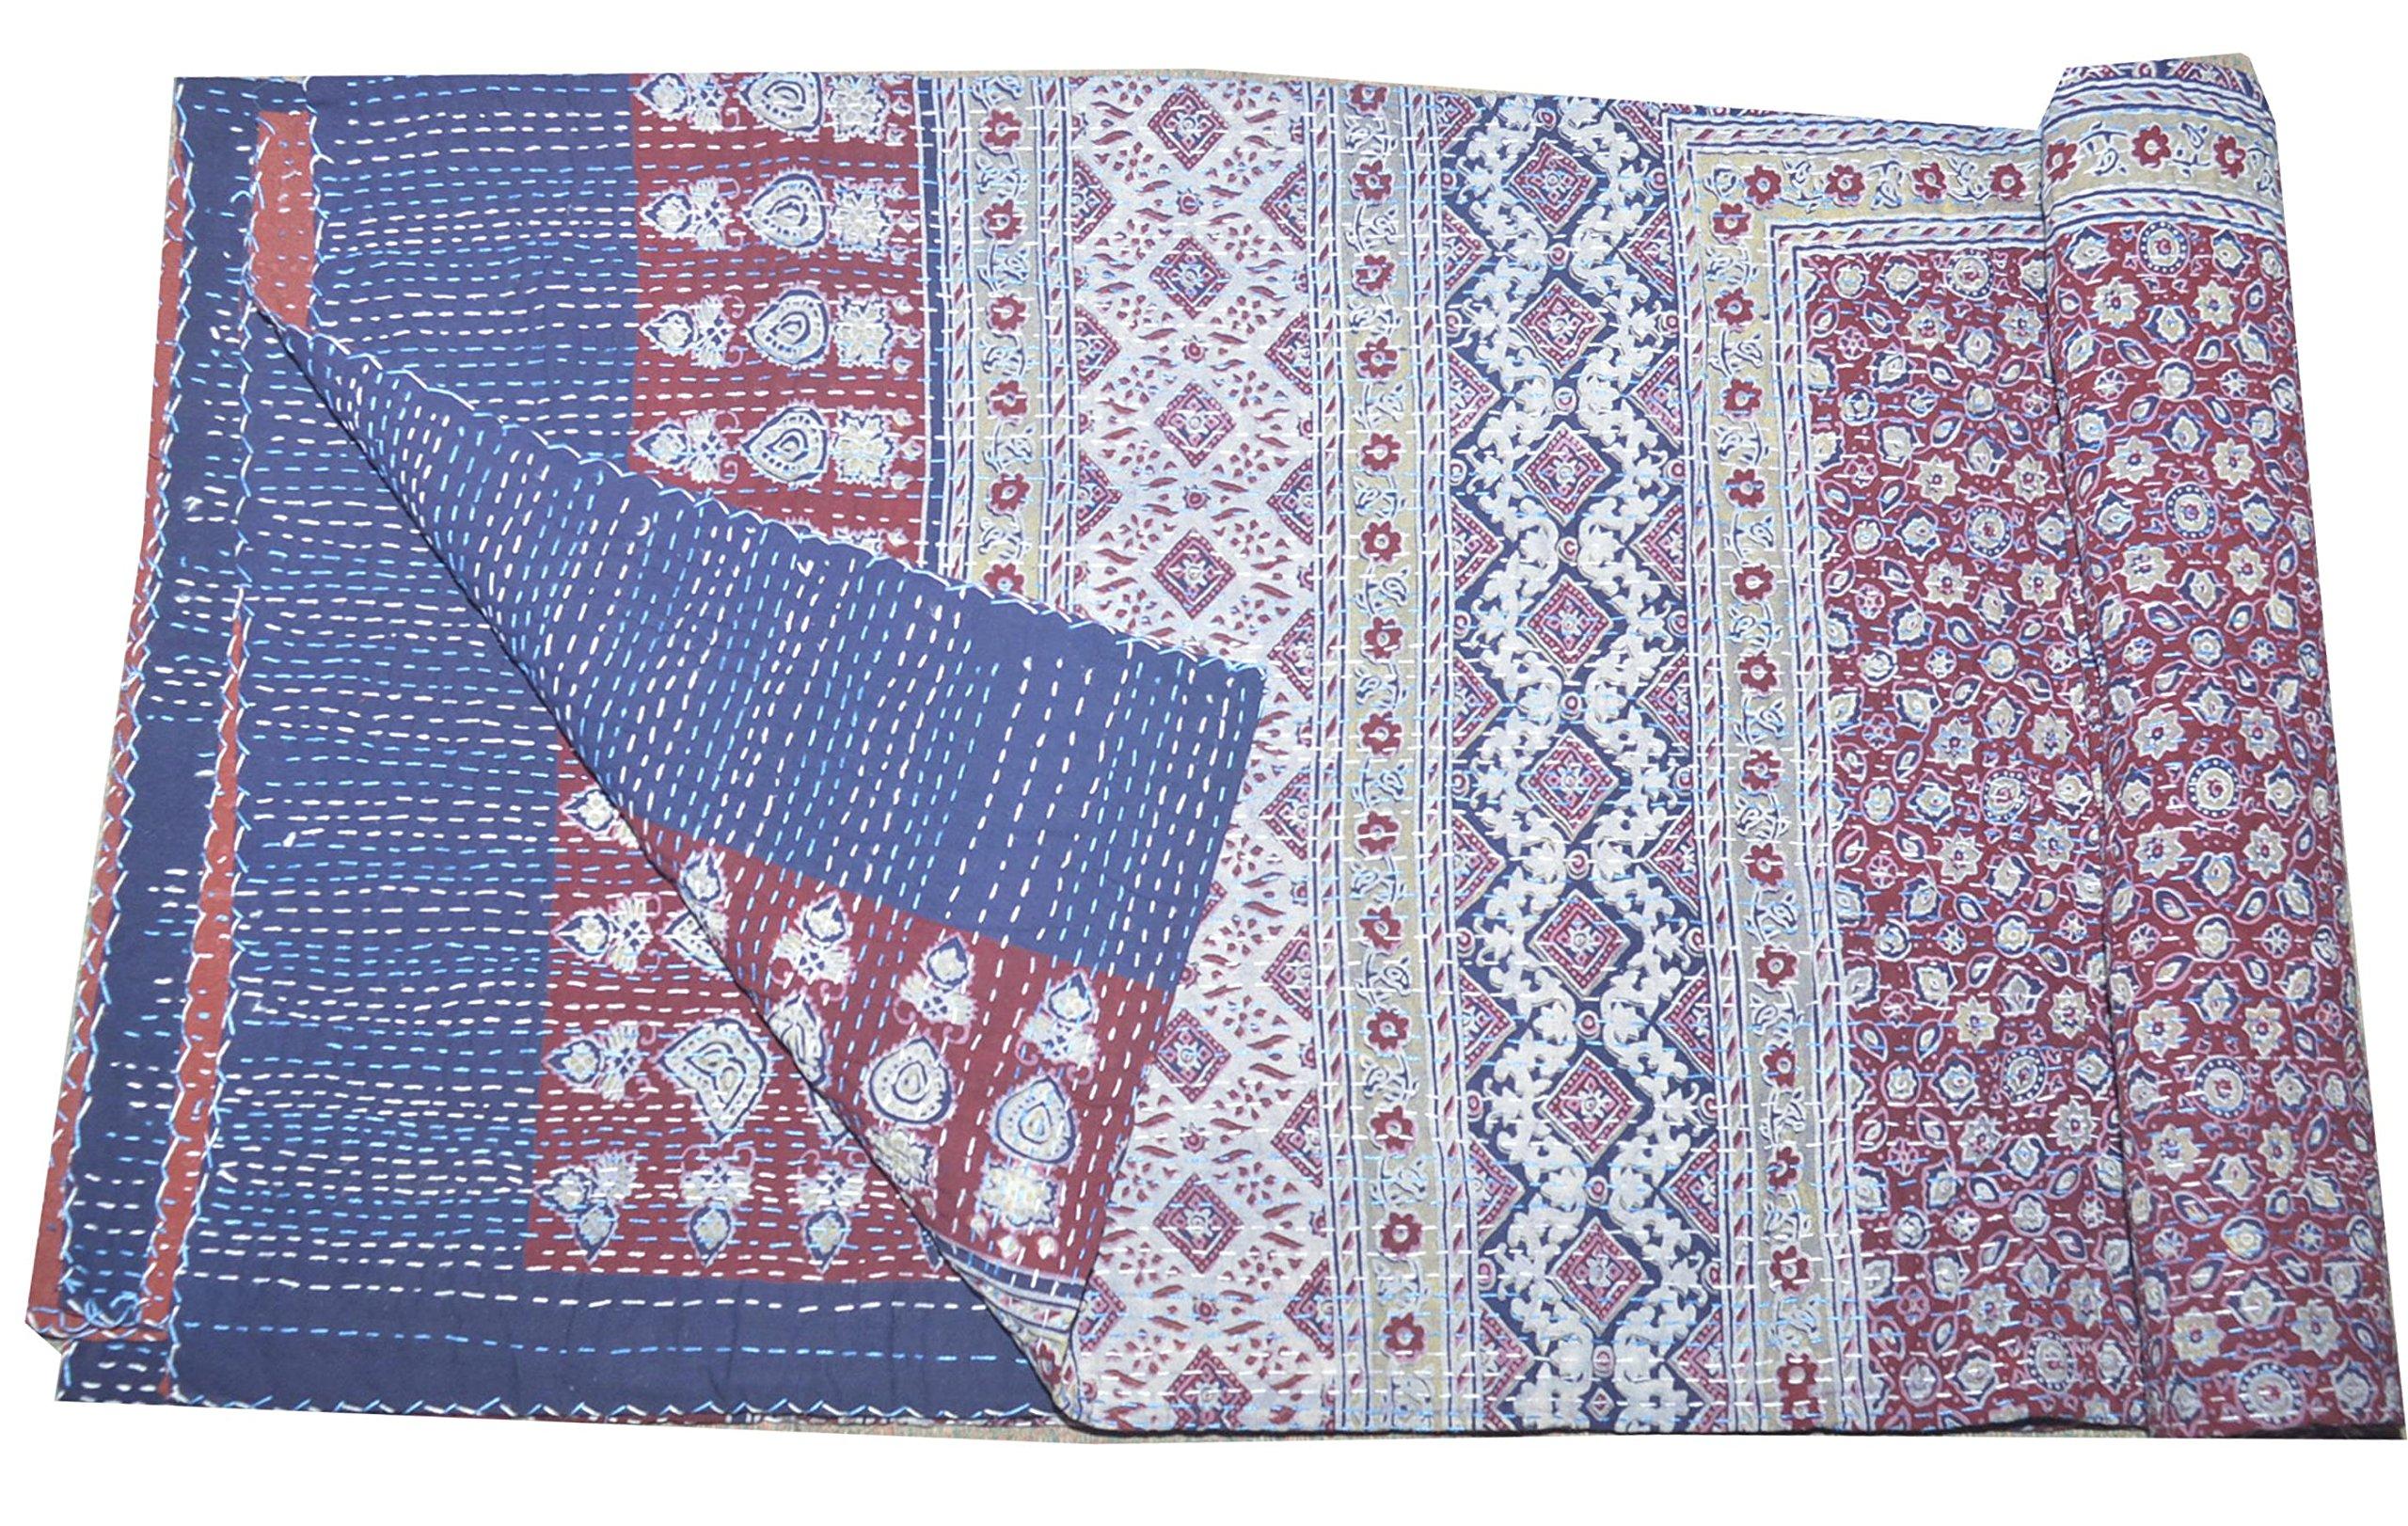 Tribal Asian Textiles Queen Size Ajarak Kantha Quilt Cotton Reversible Ralli Bed Spread Blanket Throw (Blue Rustic Design)